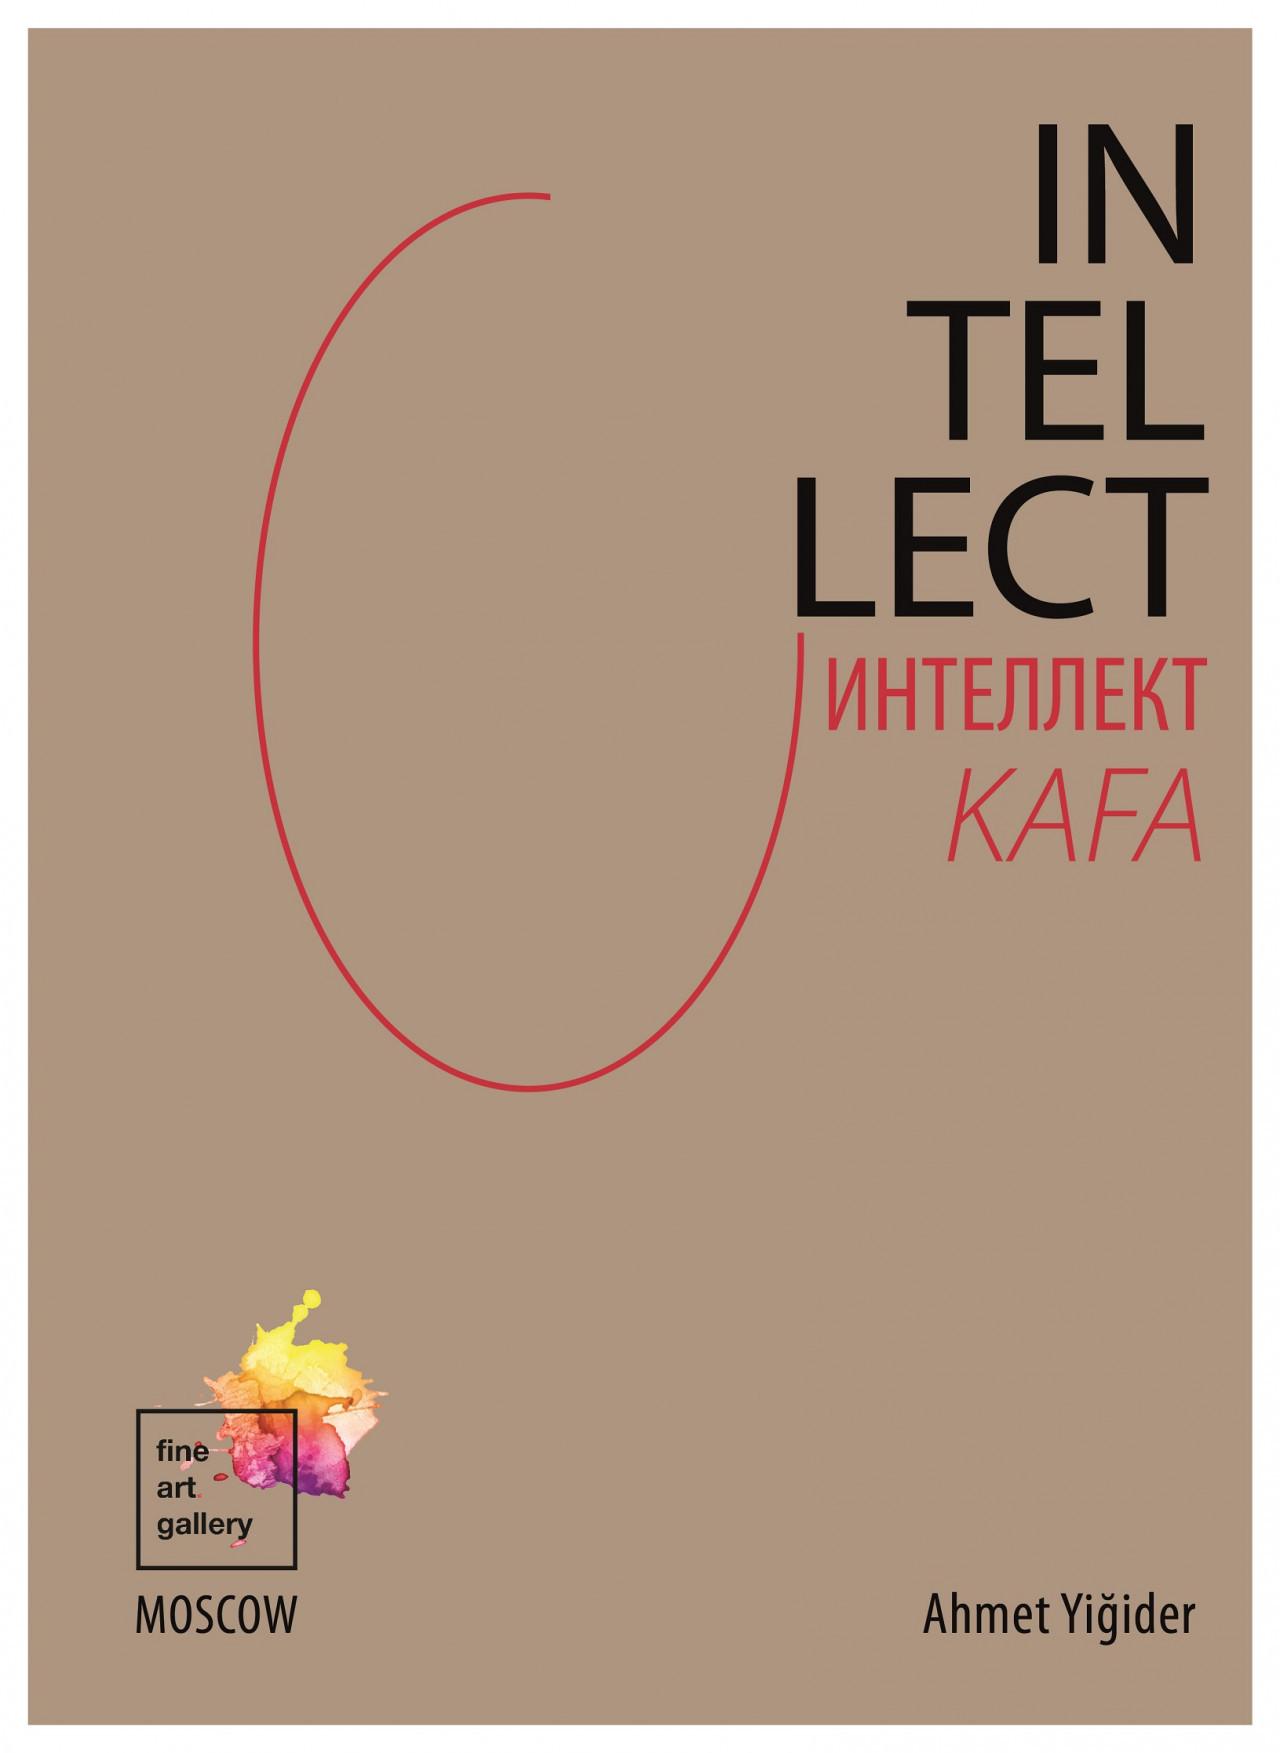 'Intellect / Kafa' sergisi 8 Nisan'da Moskova'da açılıyor